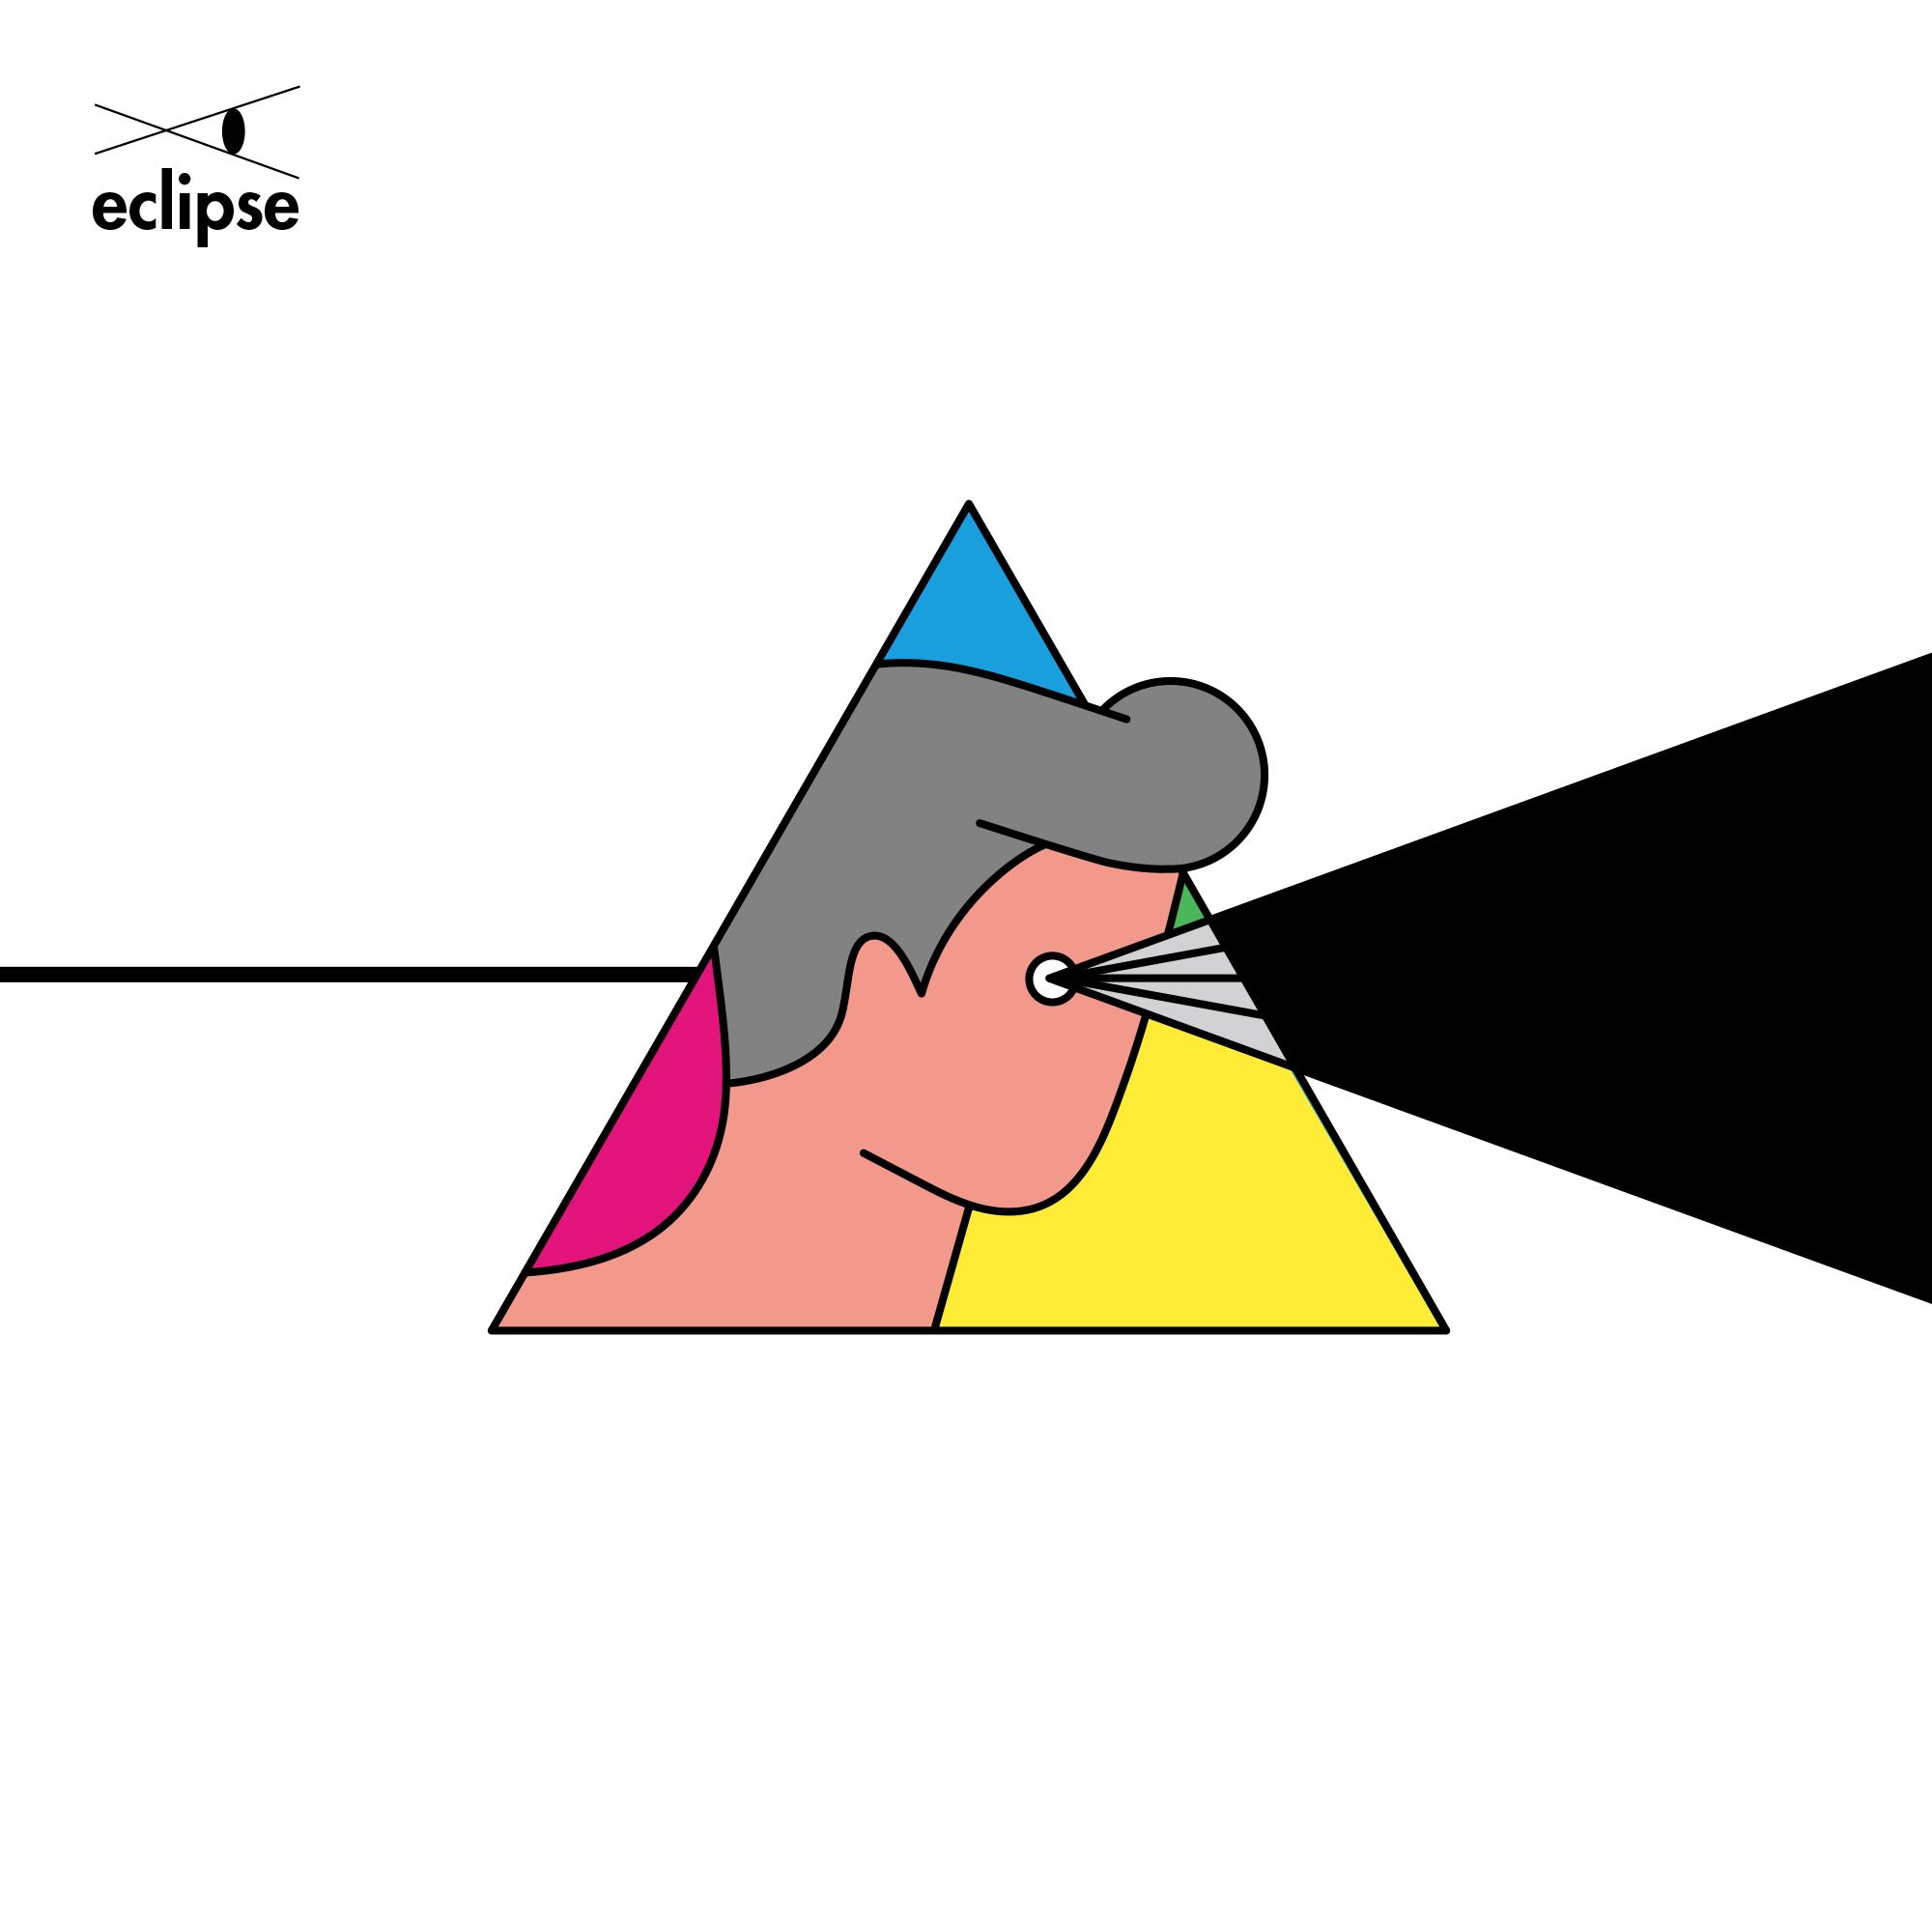 Agent89 프로젝트와 함께한 작업. Pink floyd의 'eclips' 의 싱글 앨범자켓을 새롭게 표현했다.